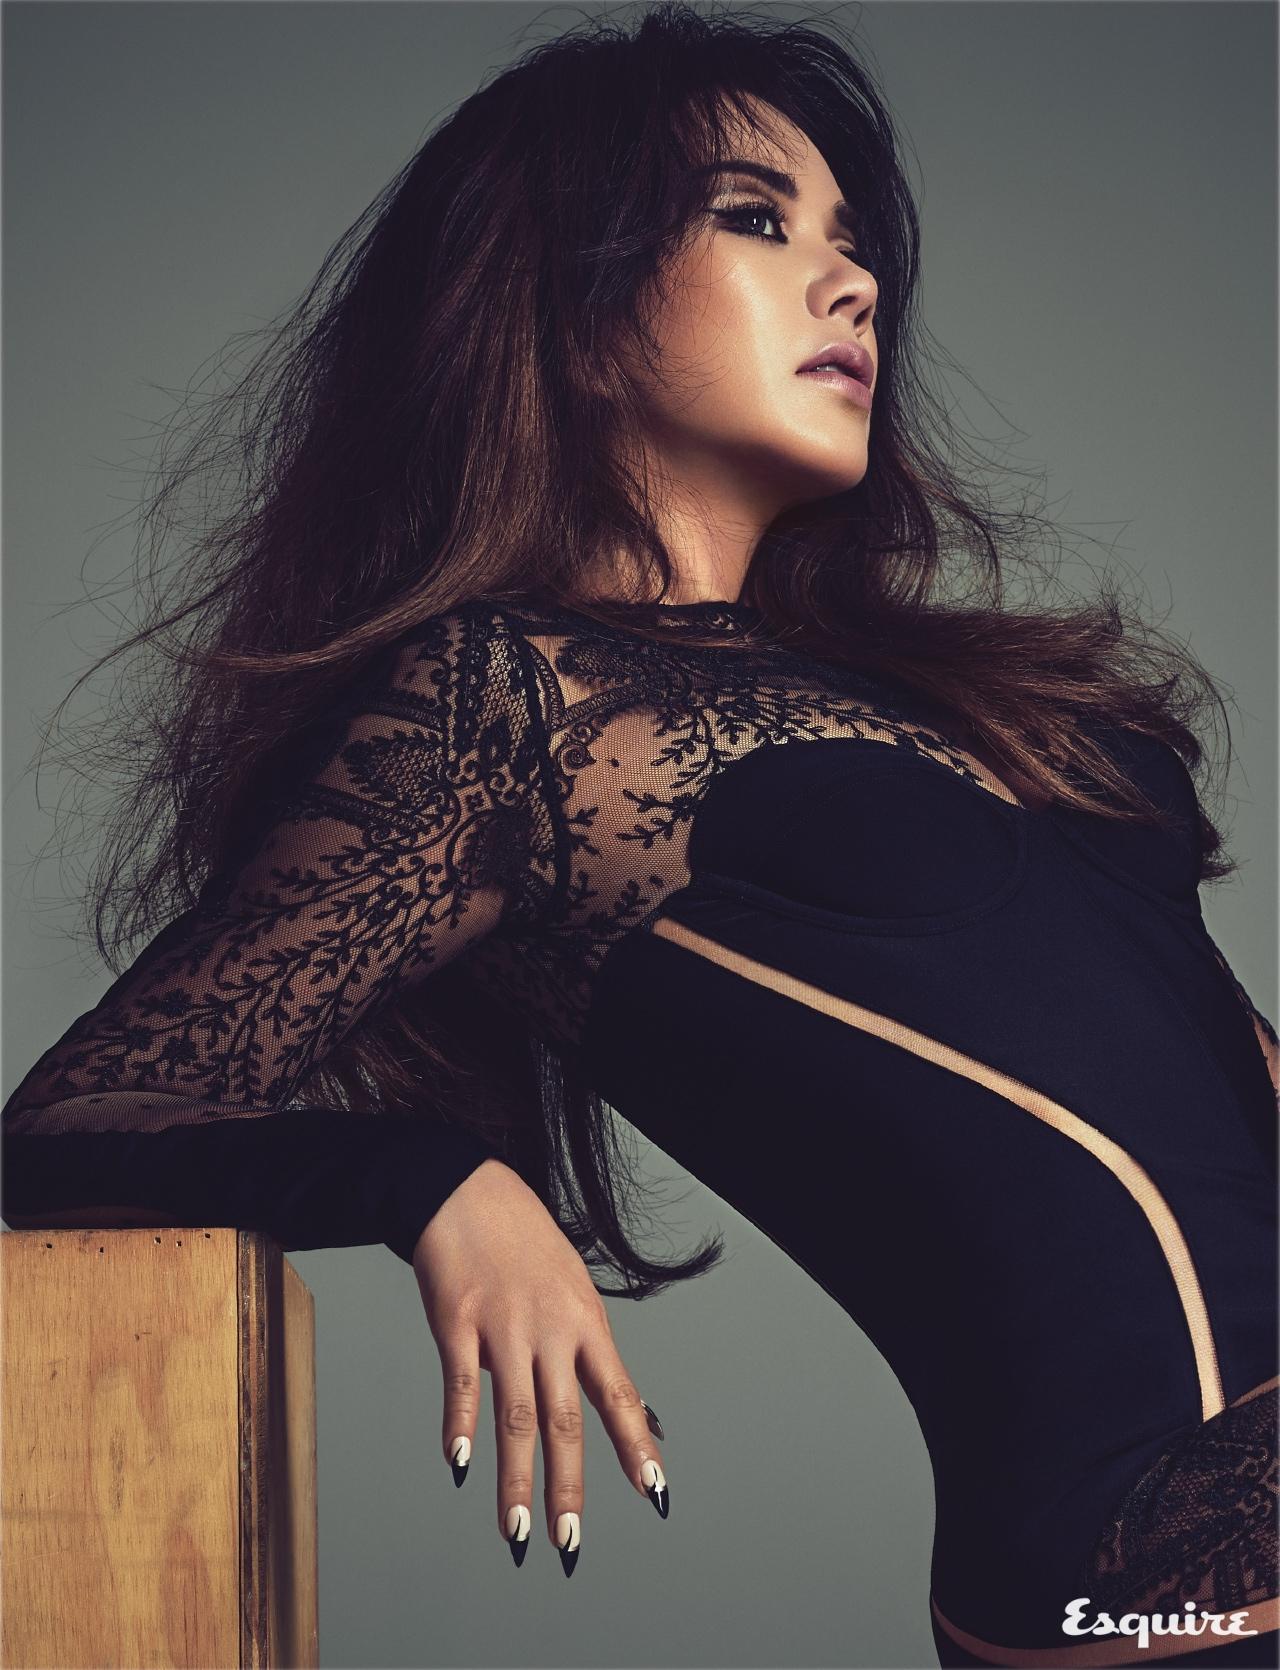 WATCH ME MOVE - 에스콰이어 Esquire Korea 2017년 1월호